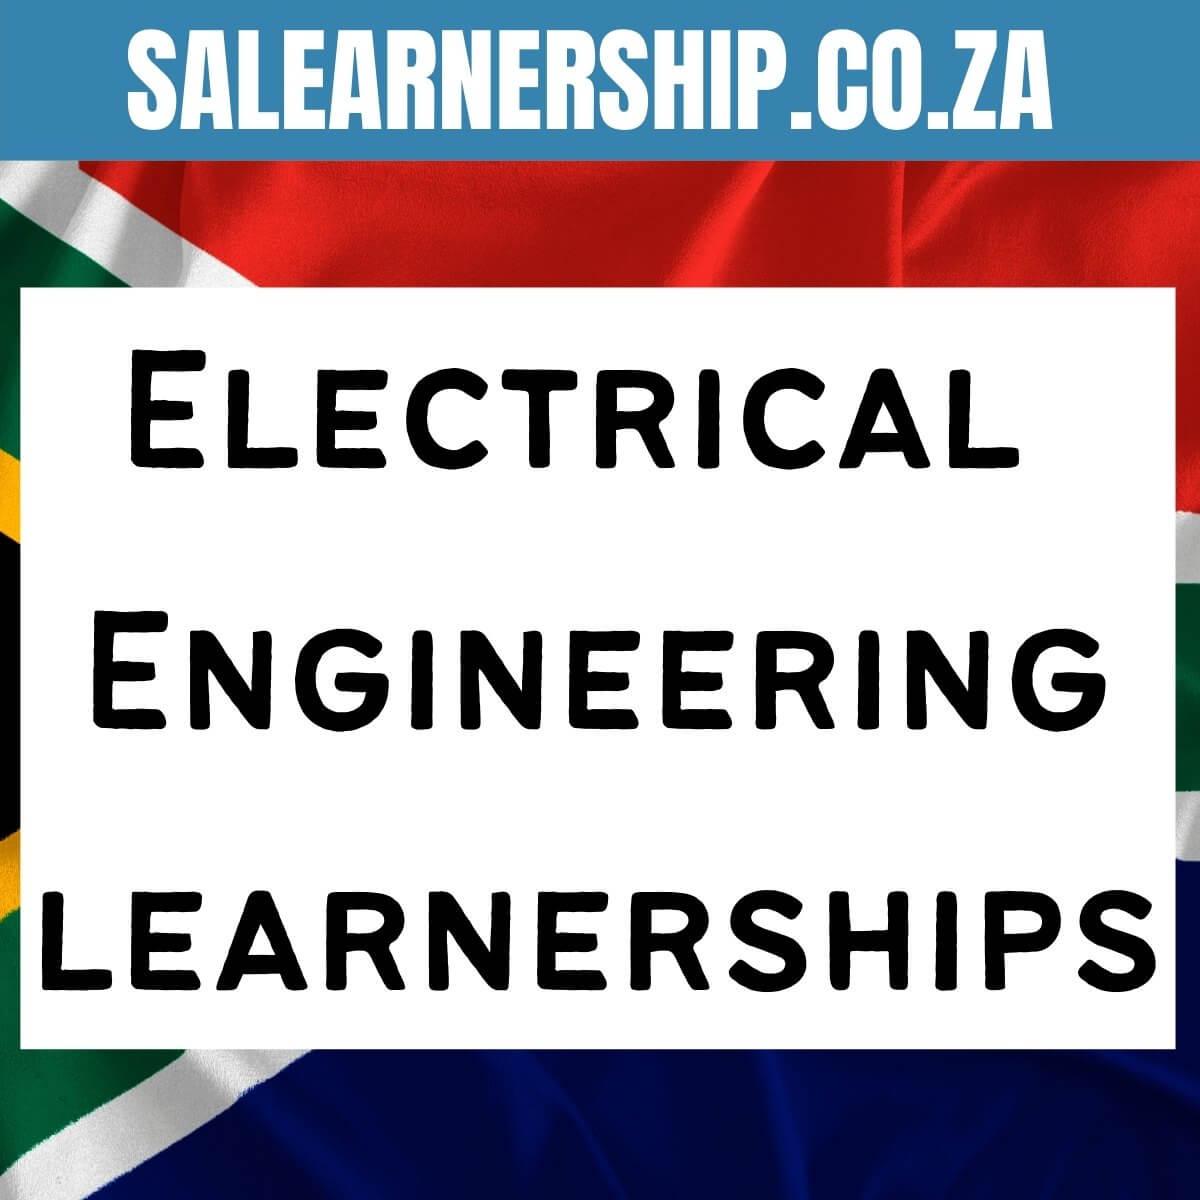 Electrical Engineering learnerships